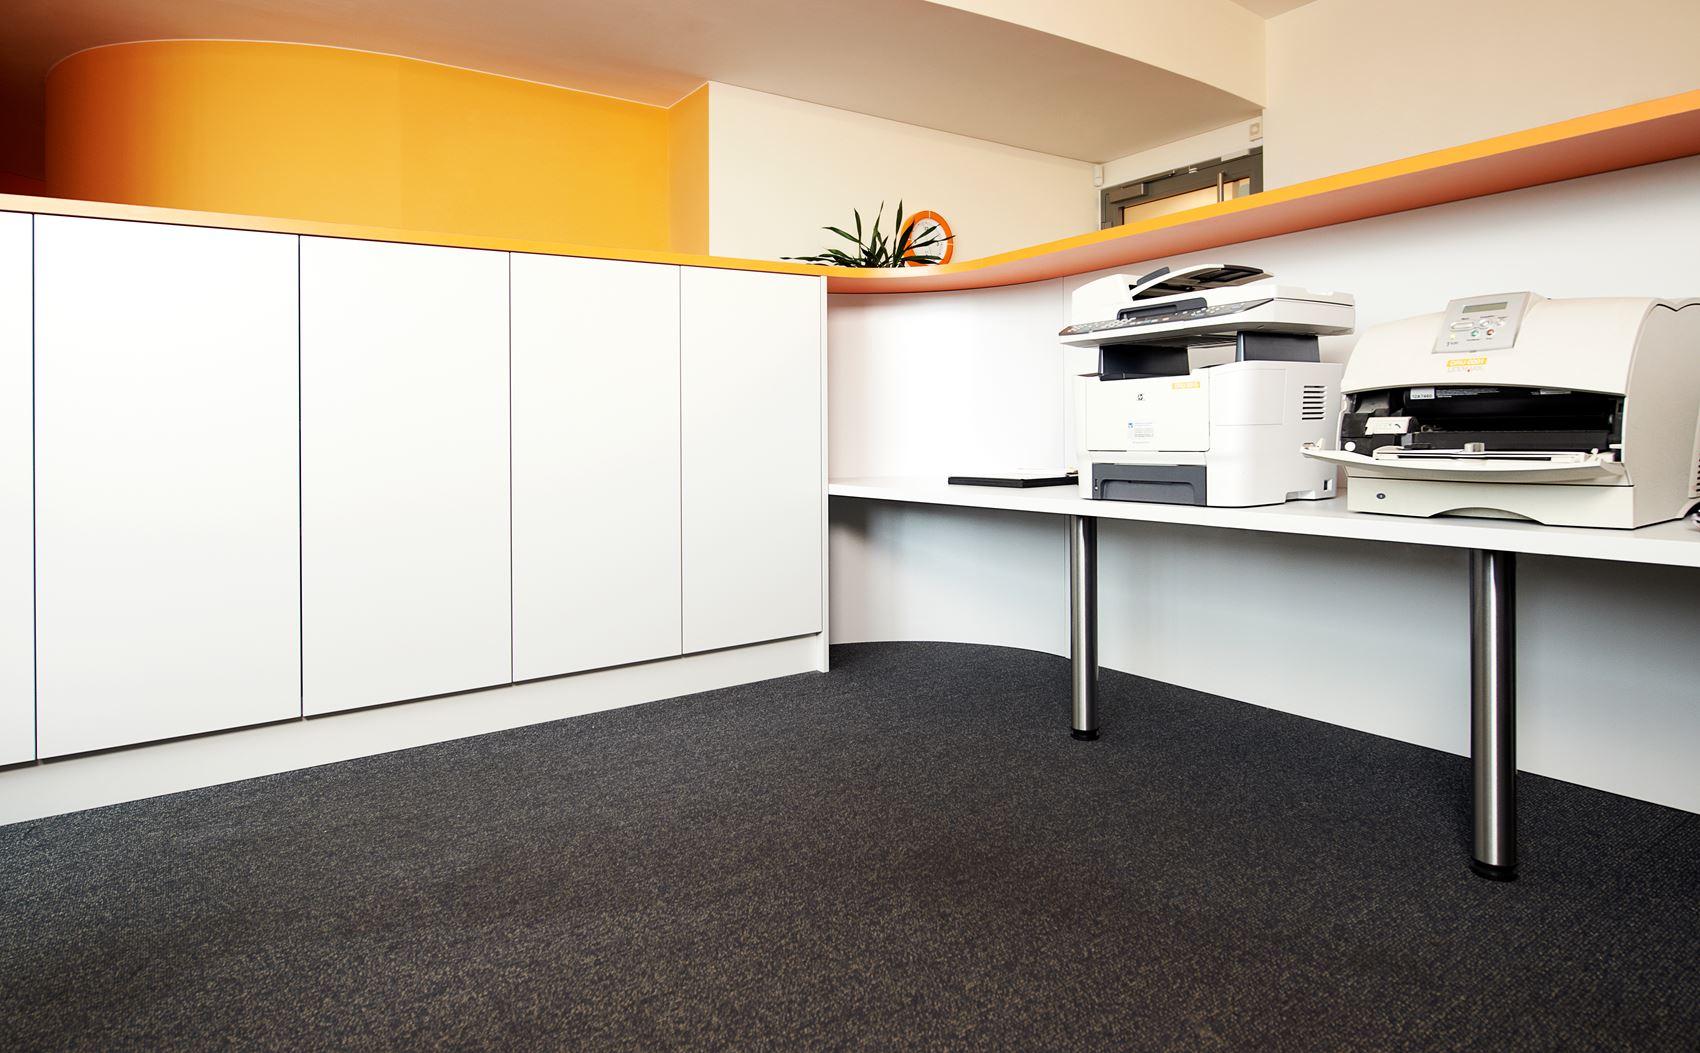 empfangstresen in firmenfarben hamburger m bel. Black Bedroom Furniture Sets. Home Design Ideas